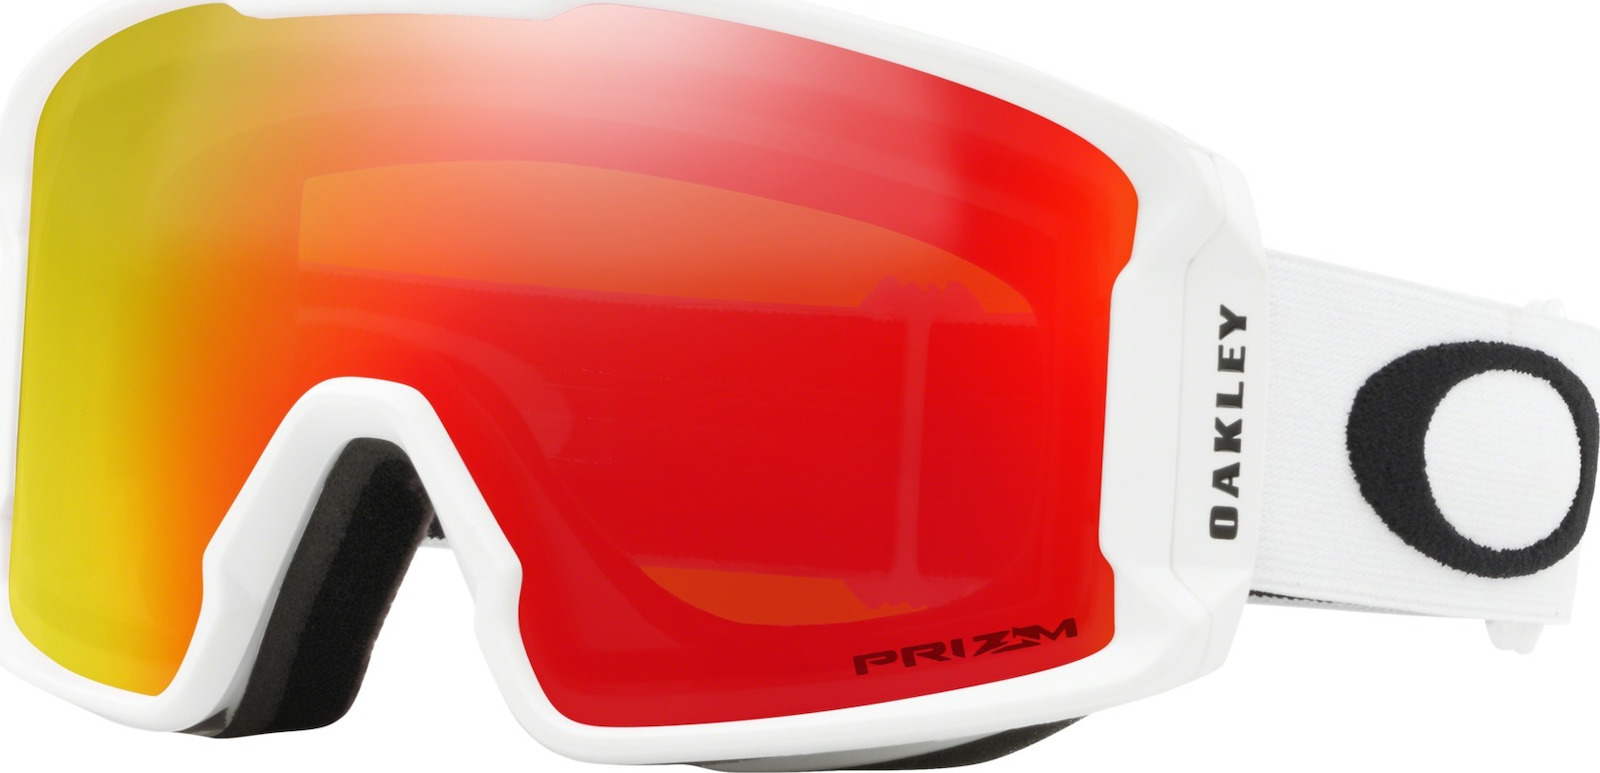 994bdf1a581 Προσθήκη στα αγαπημένα menu Oakley Line Miner XM Snow Goggle OO7093-09